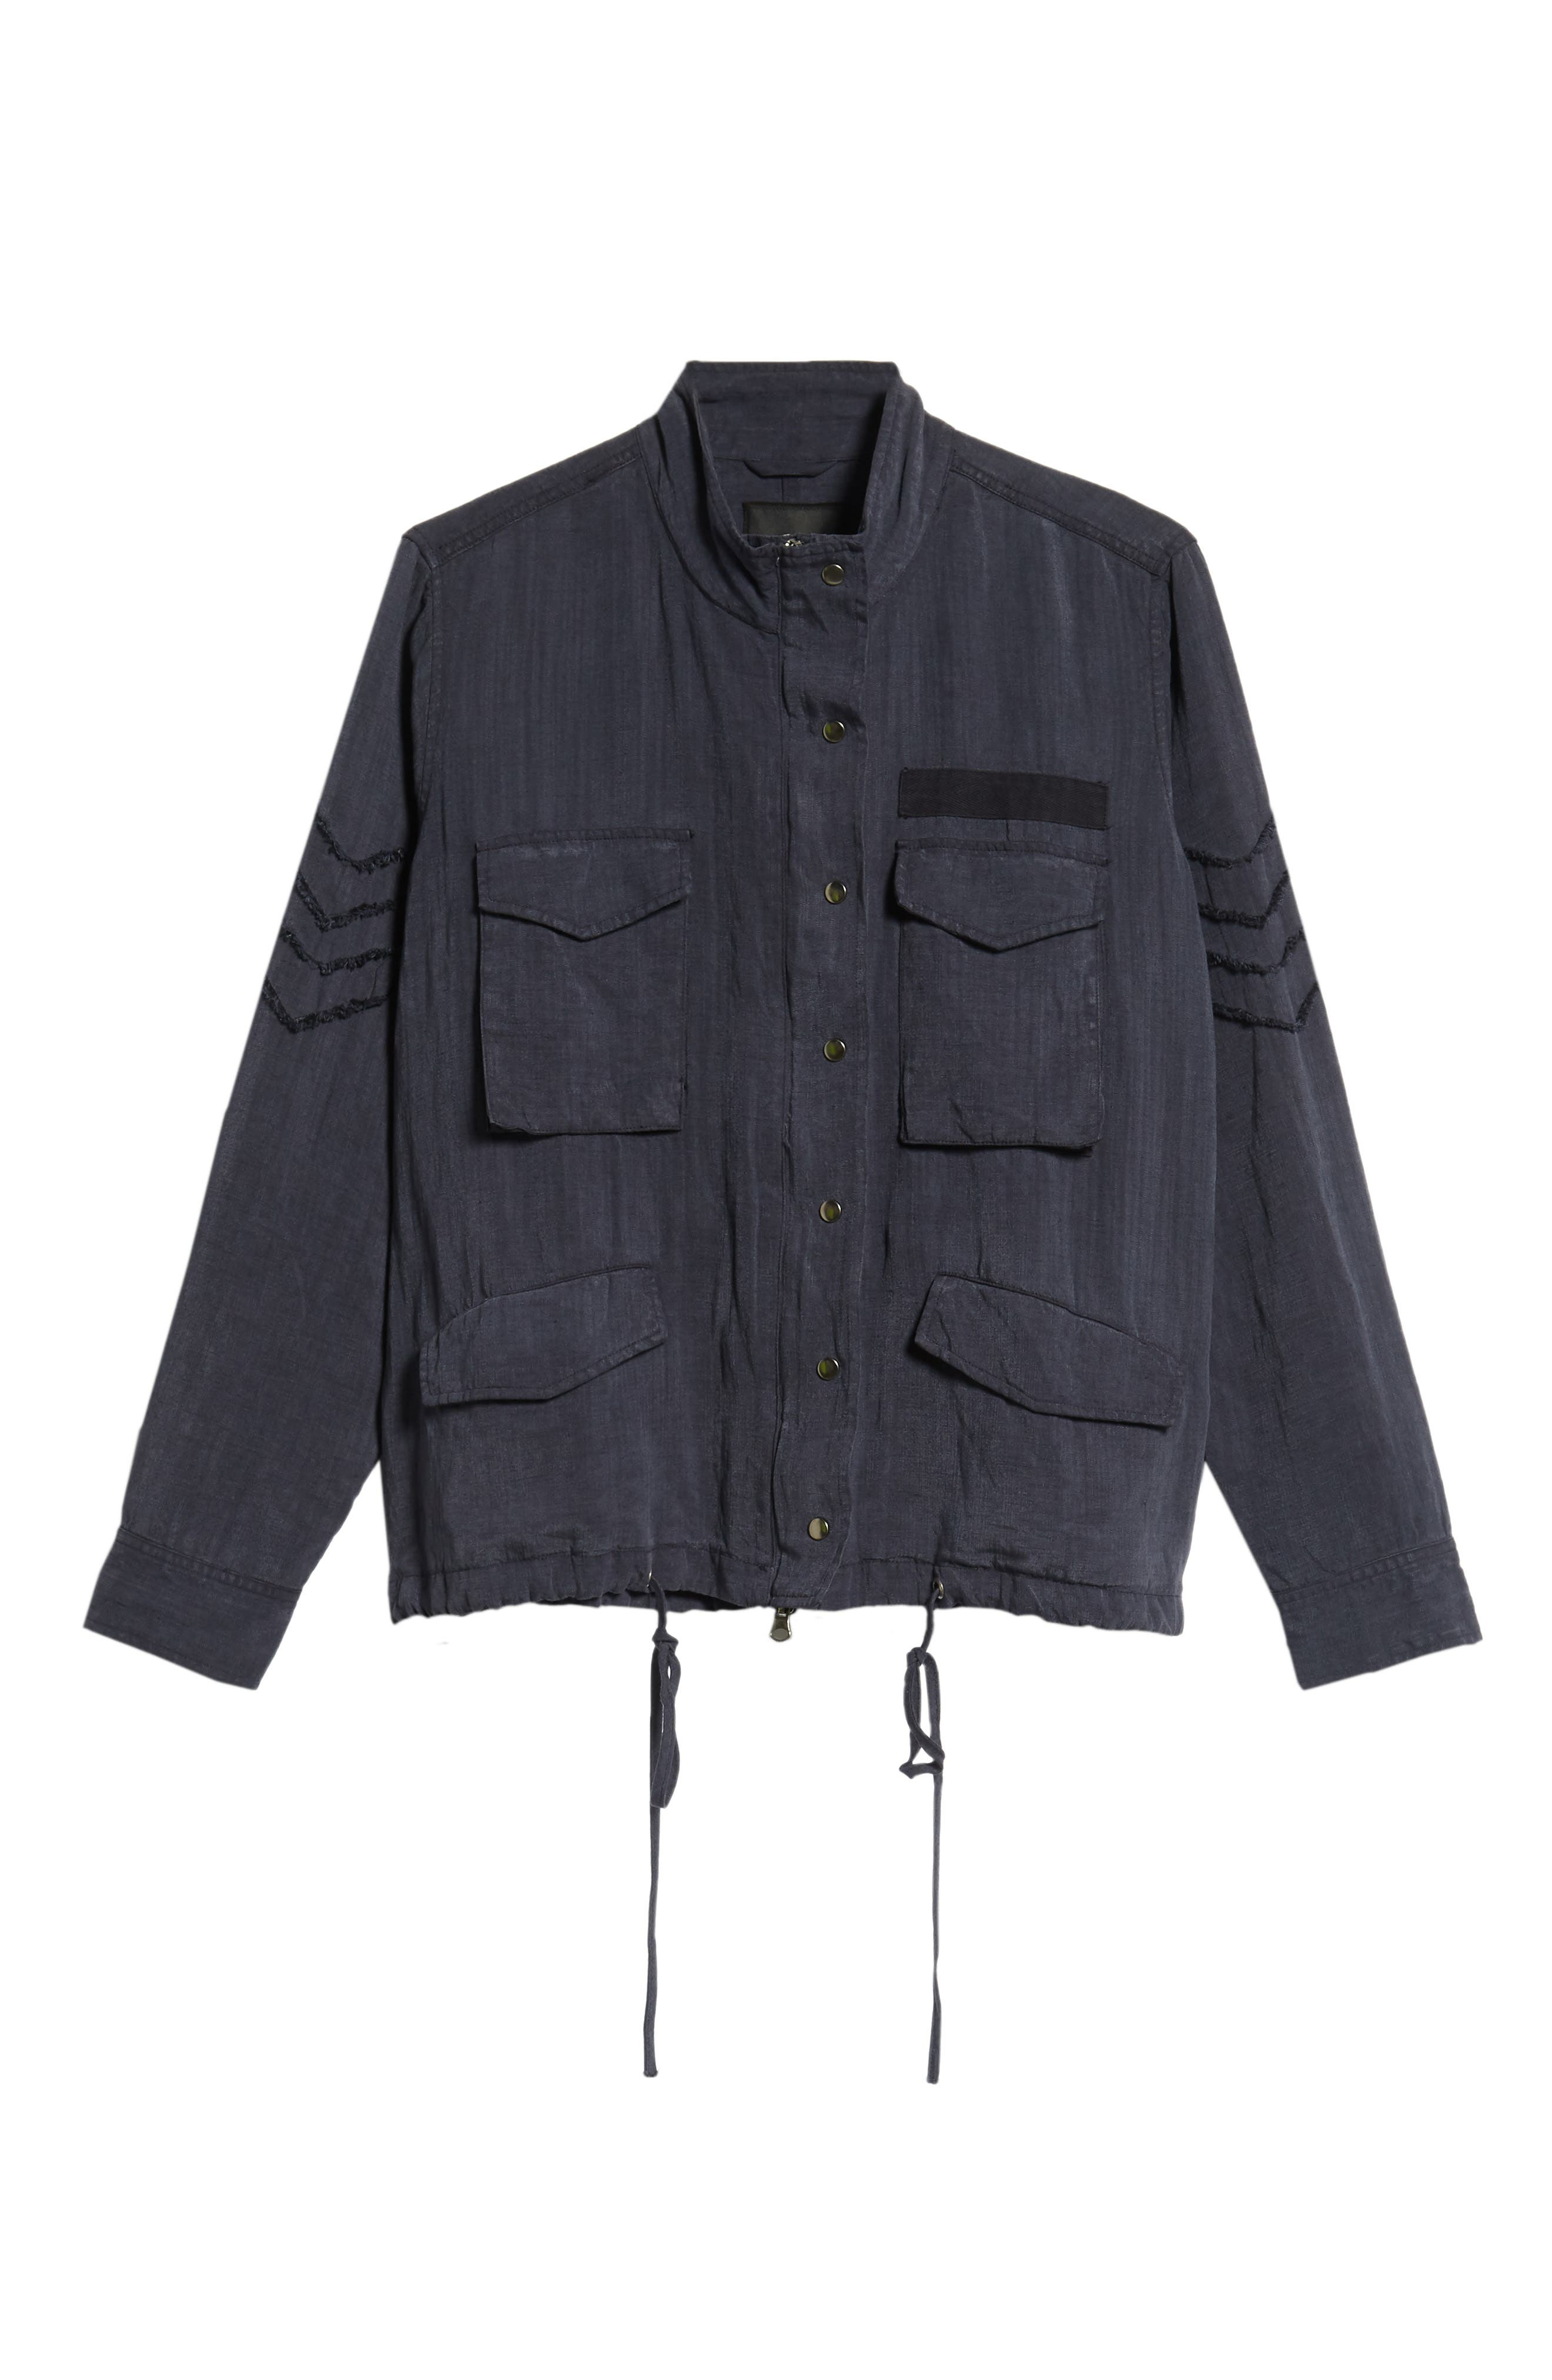 Halifax Drawstring Jacket,                             Alternate thumbnail 6, color,                             NAVY